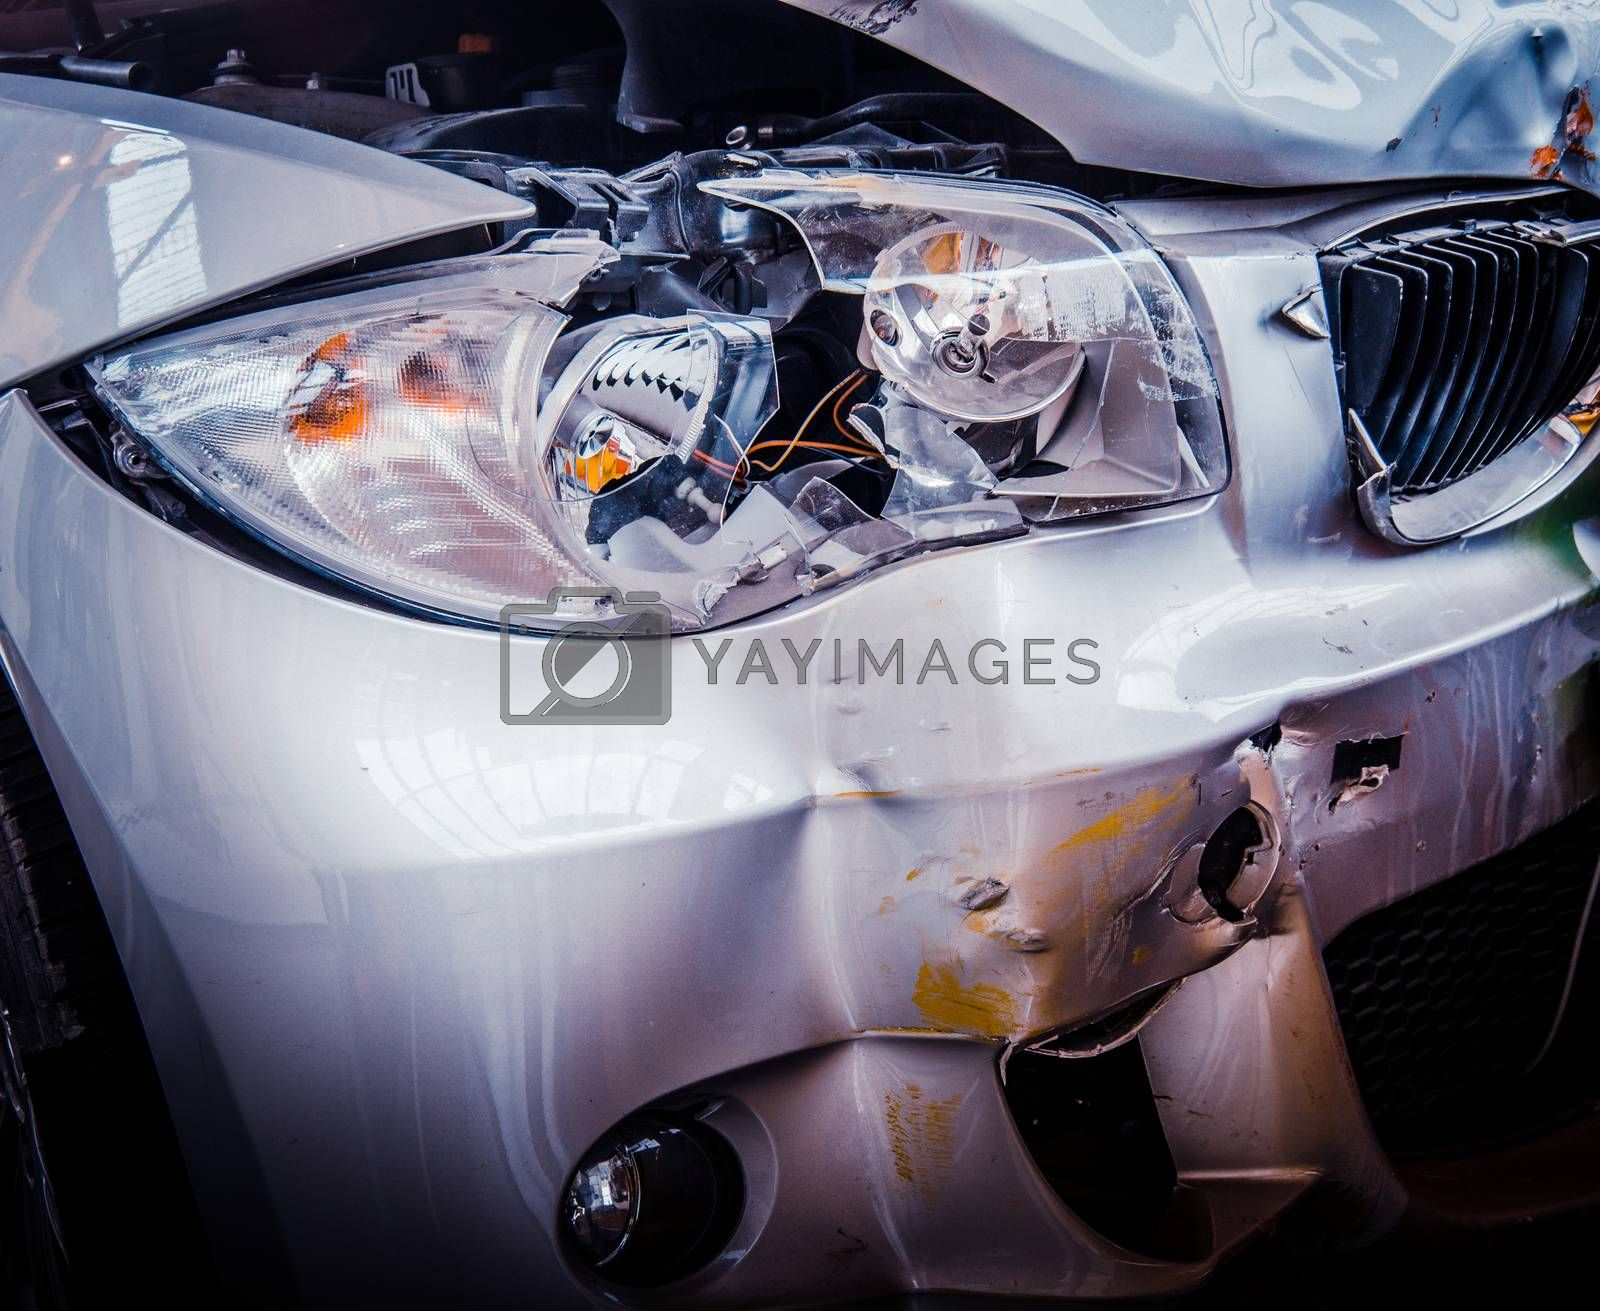 Royalty free image of Smashed Luxury Car by mrdoomits